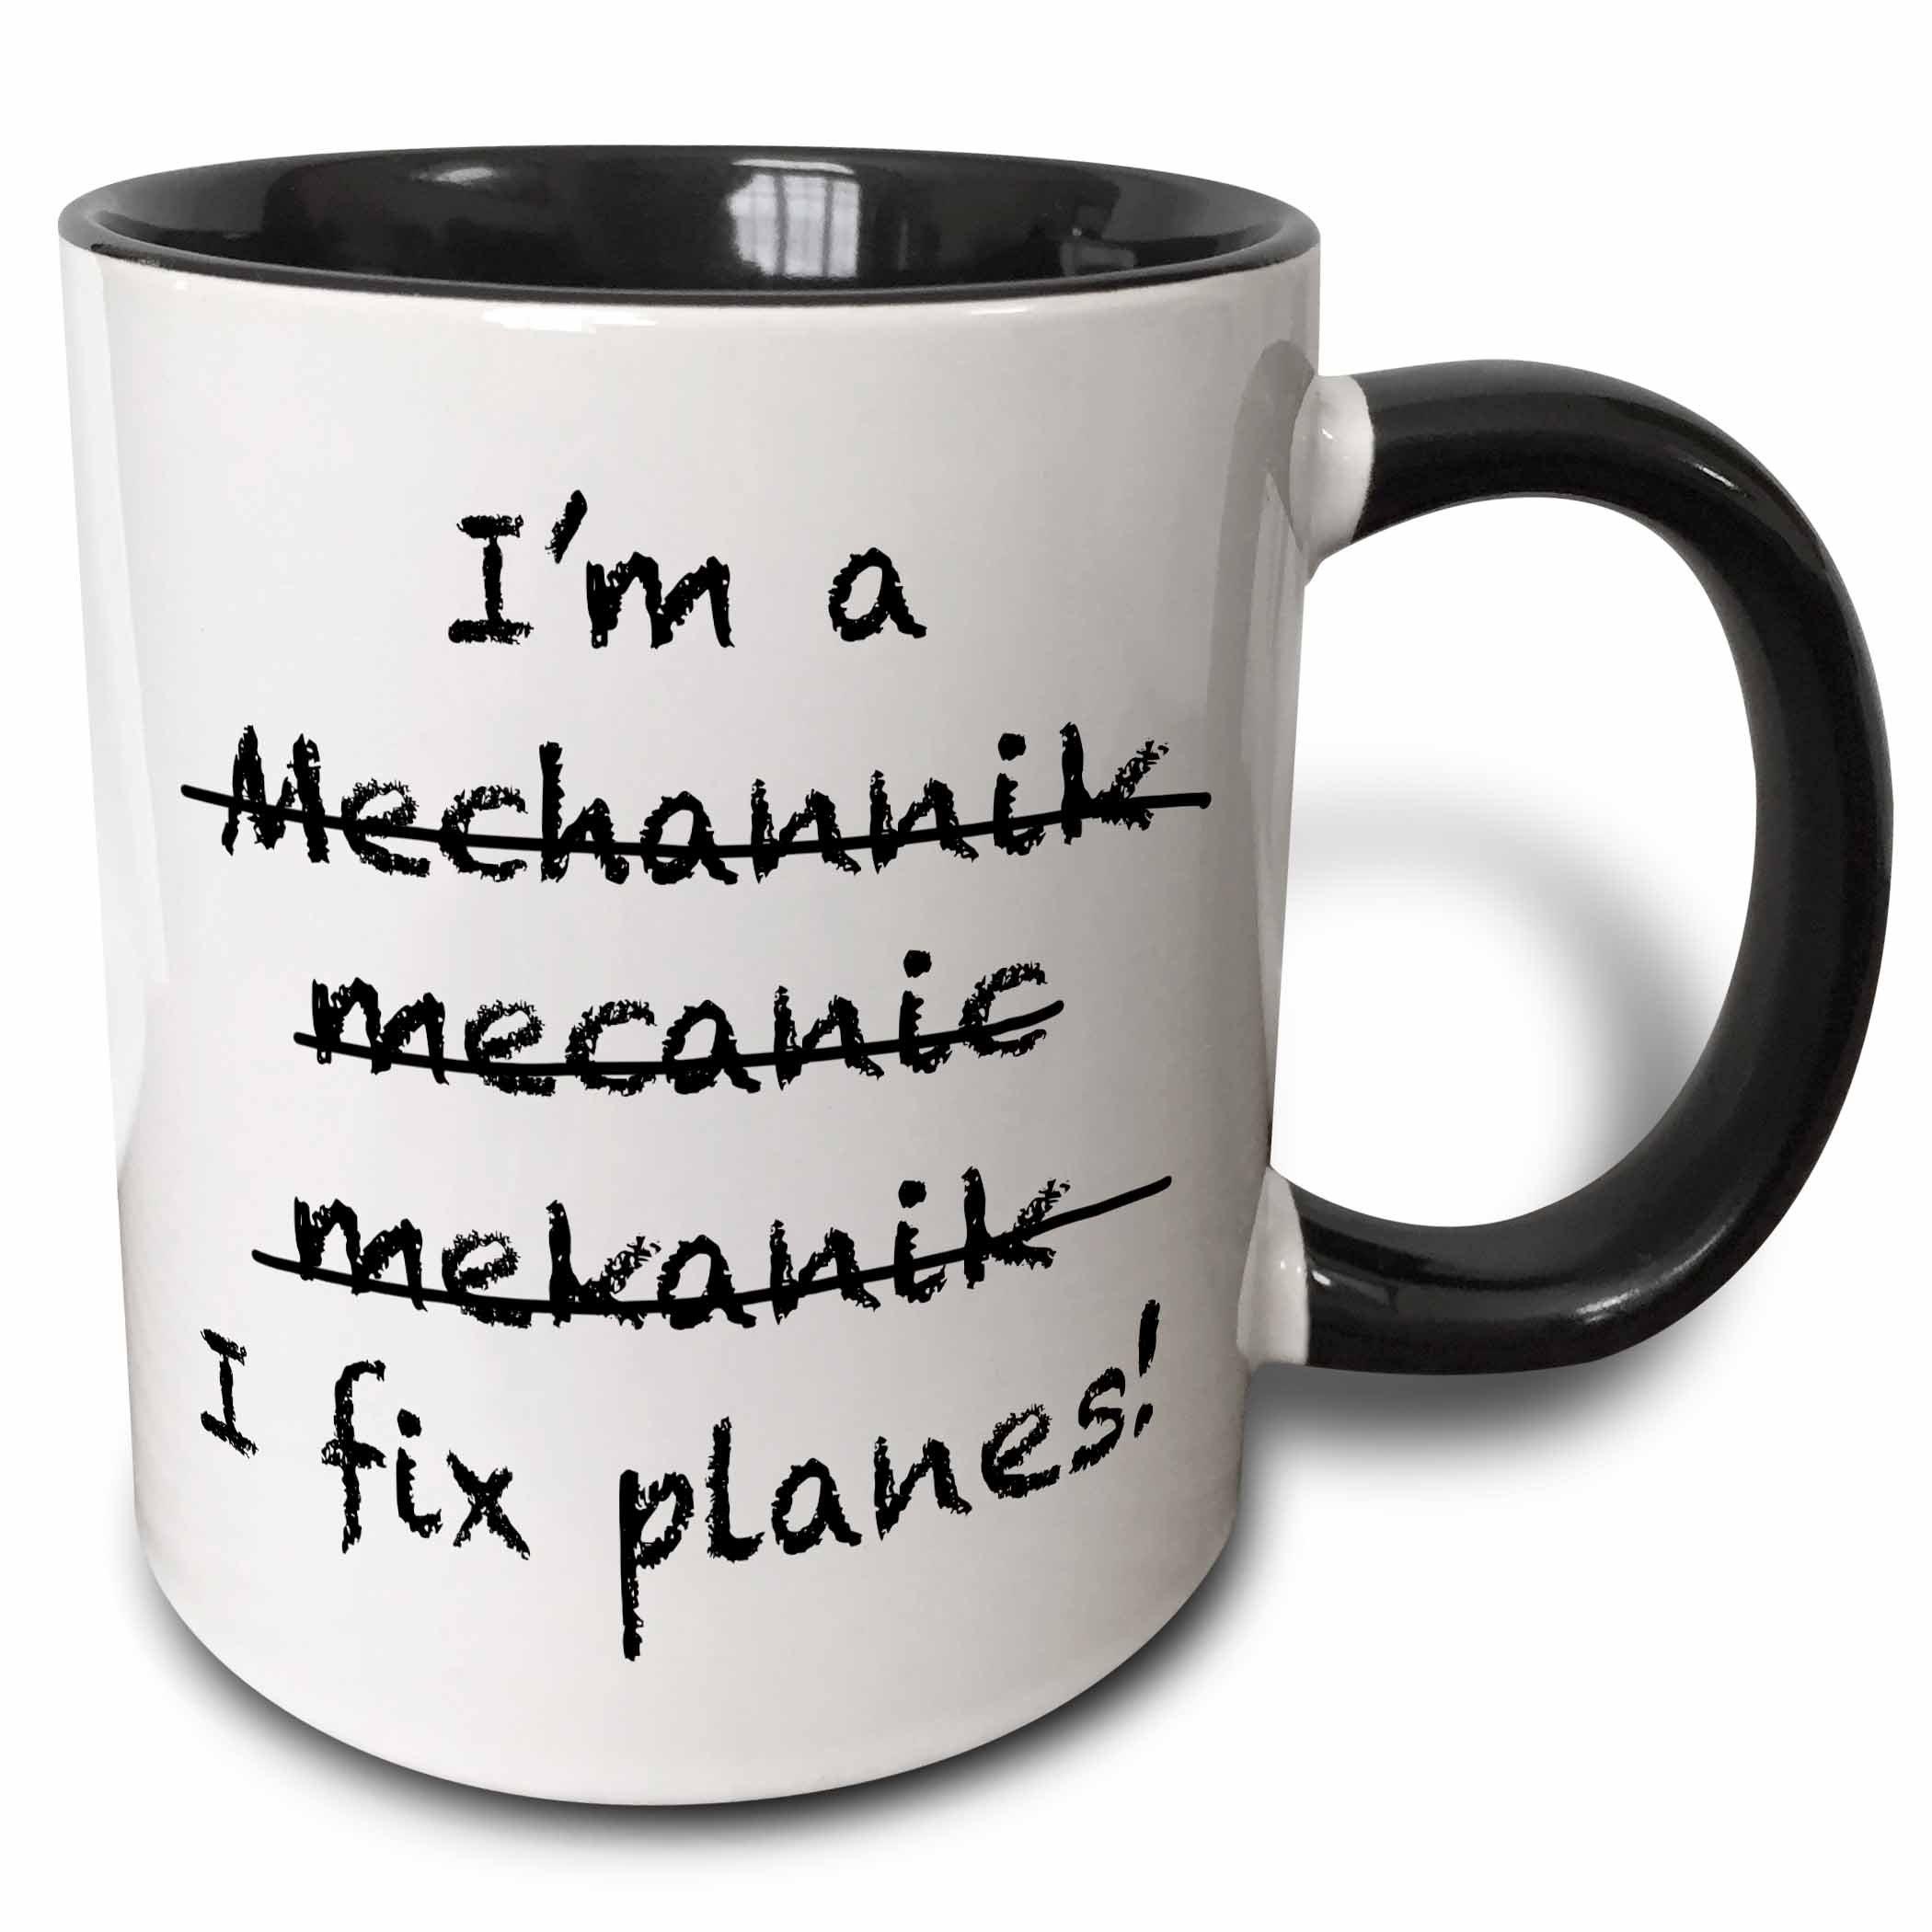 3dRose 193252_4 I'm A Mechanic I Fix Planes Two Tone Mug, 11 oz, Black